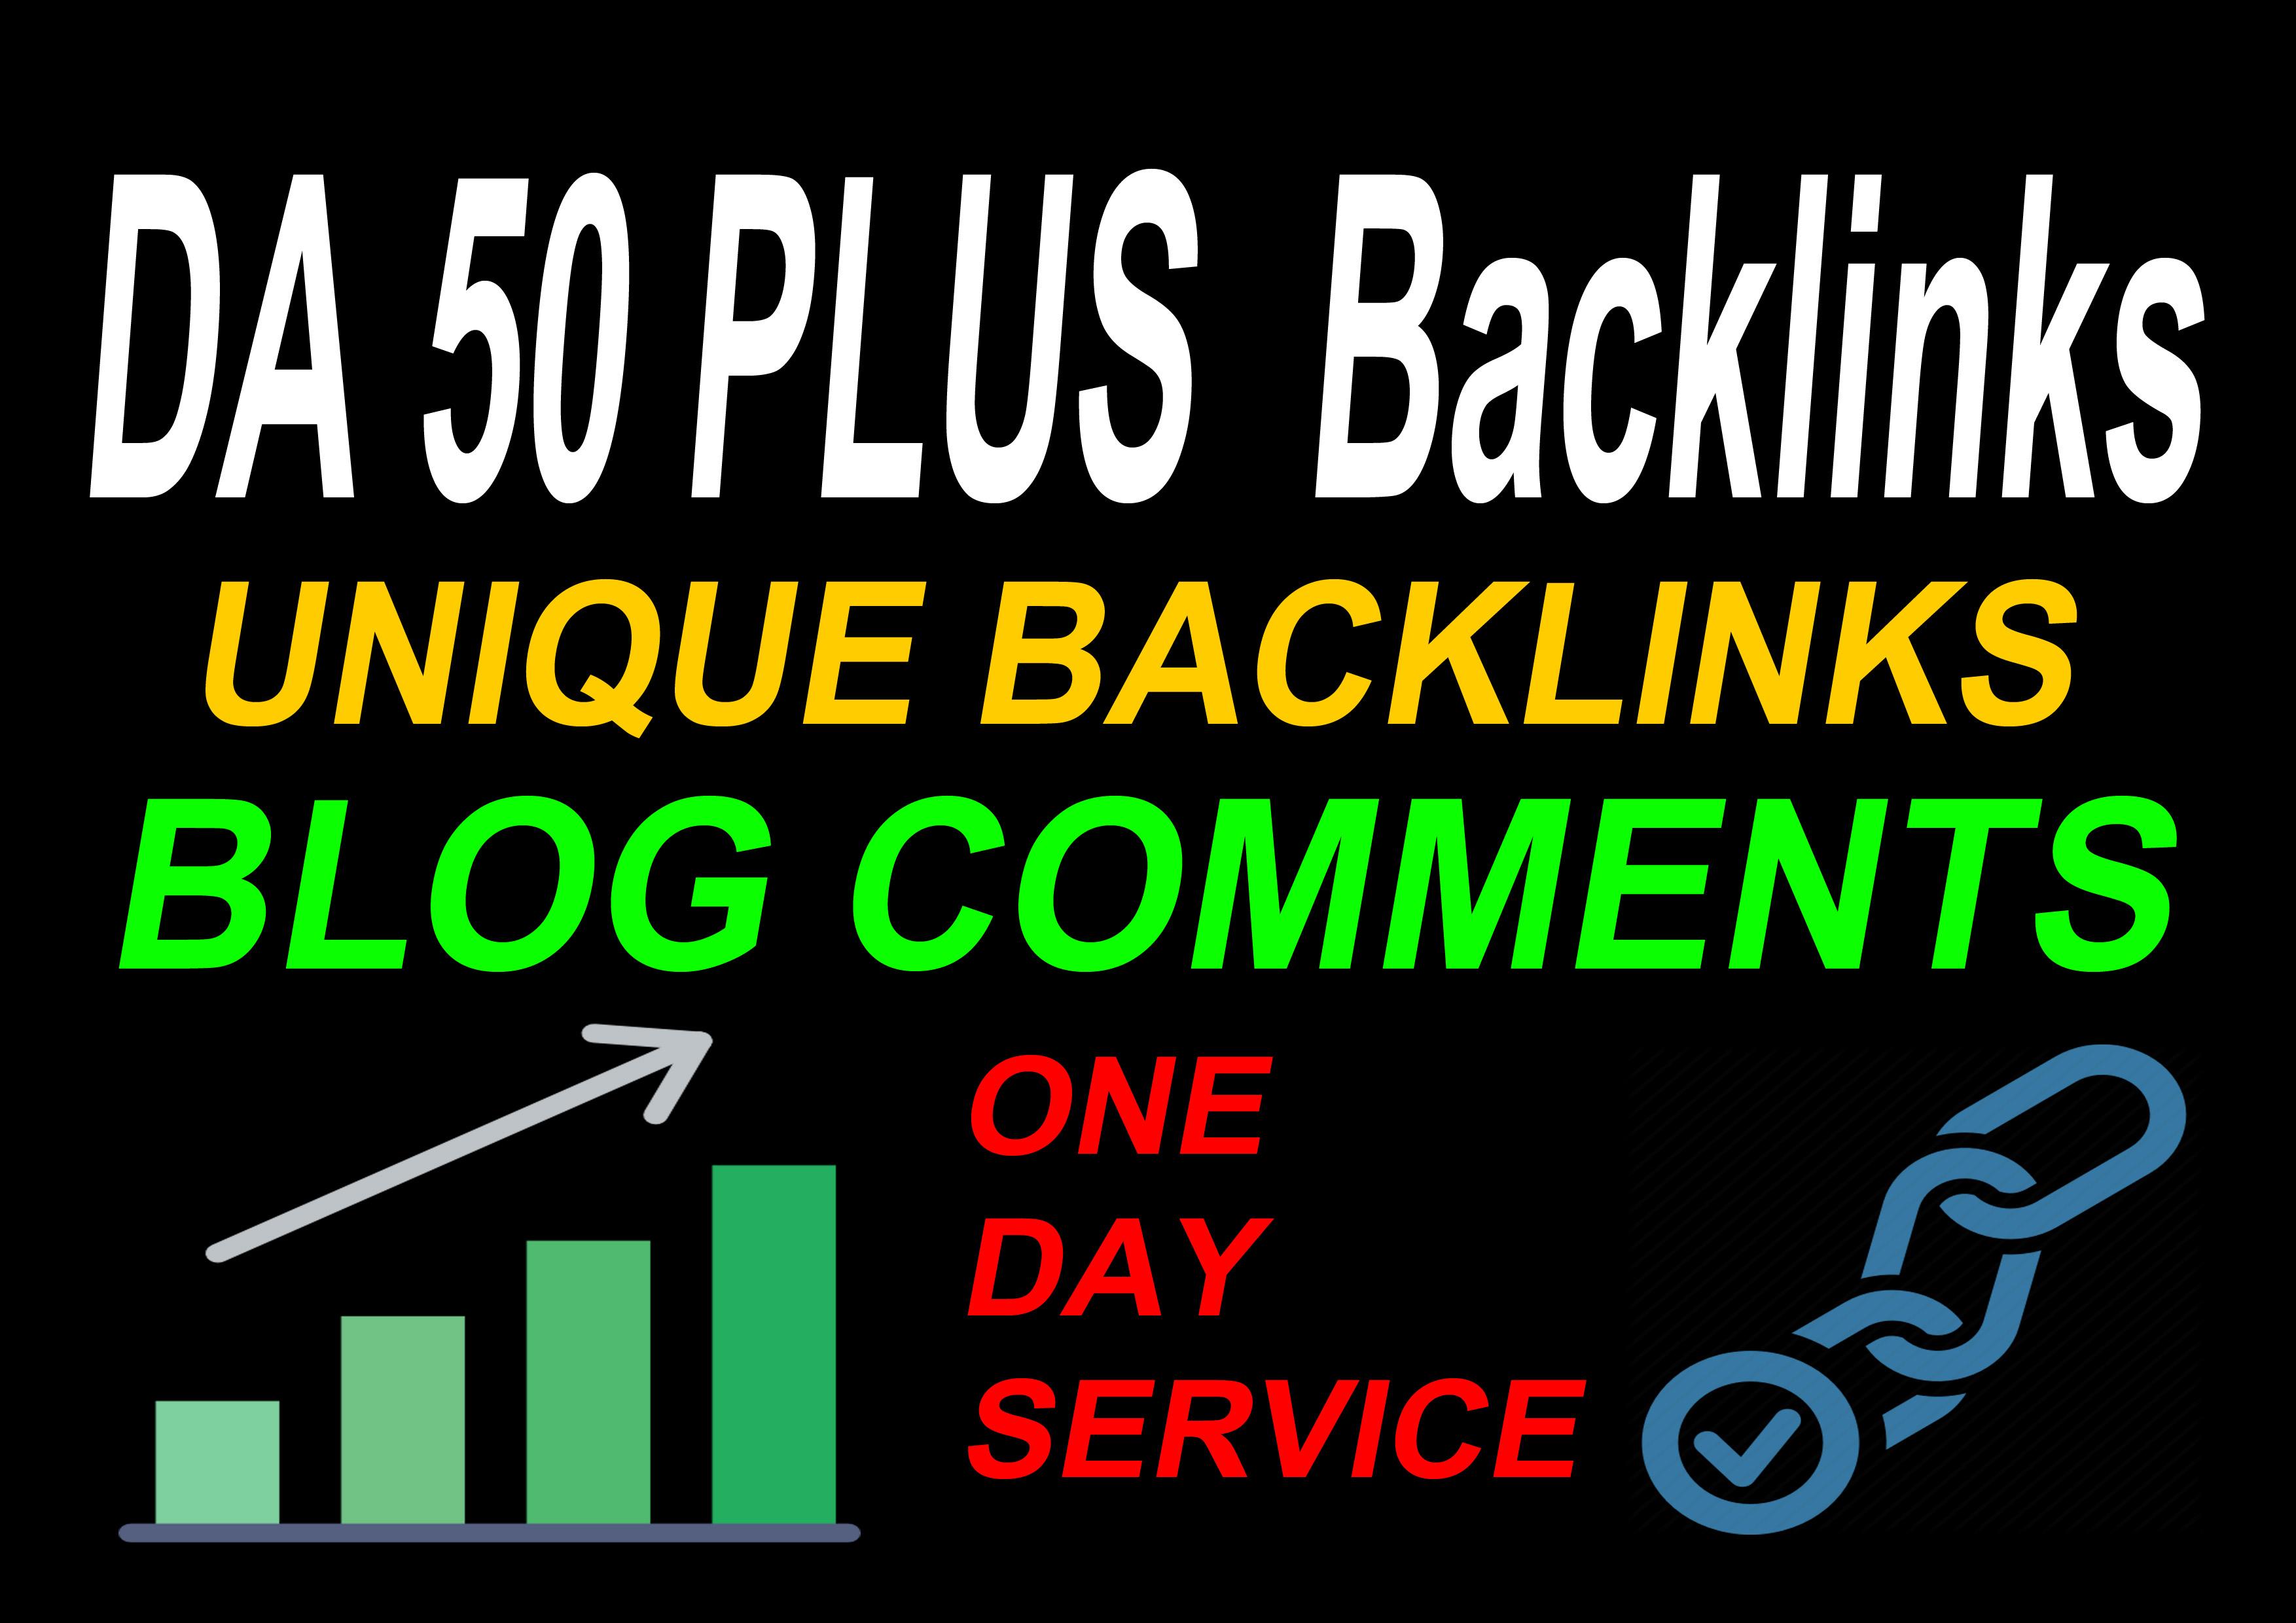 I Will Do 50 Plus DA With 42 Unique Backlinks